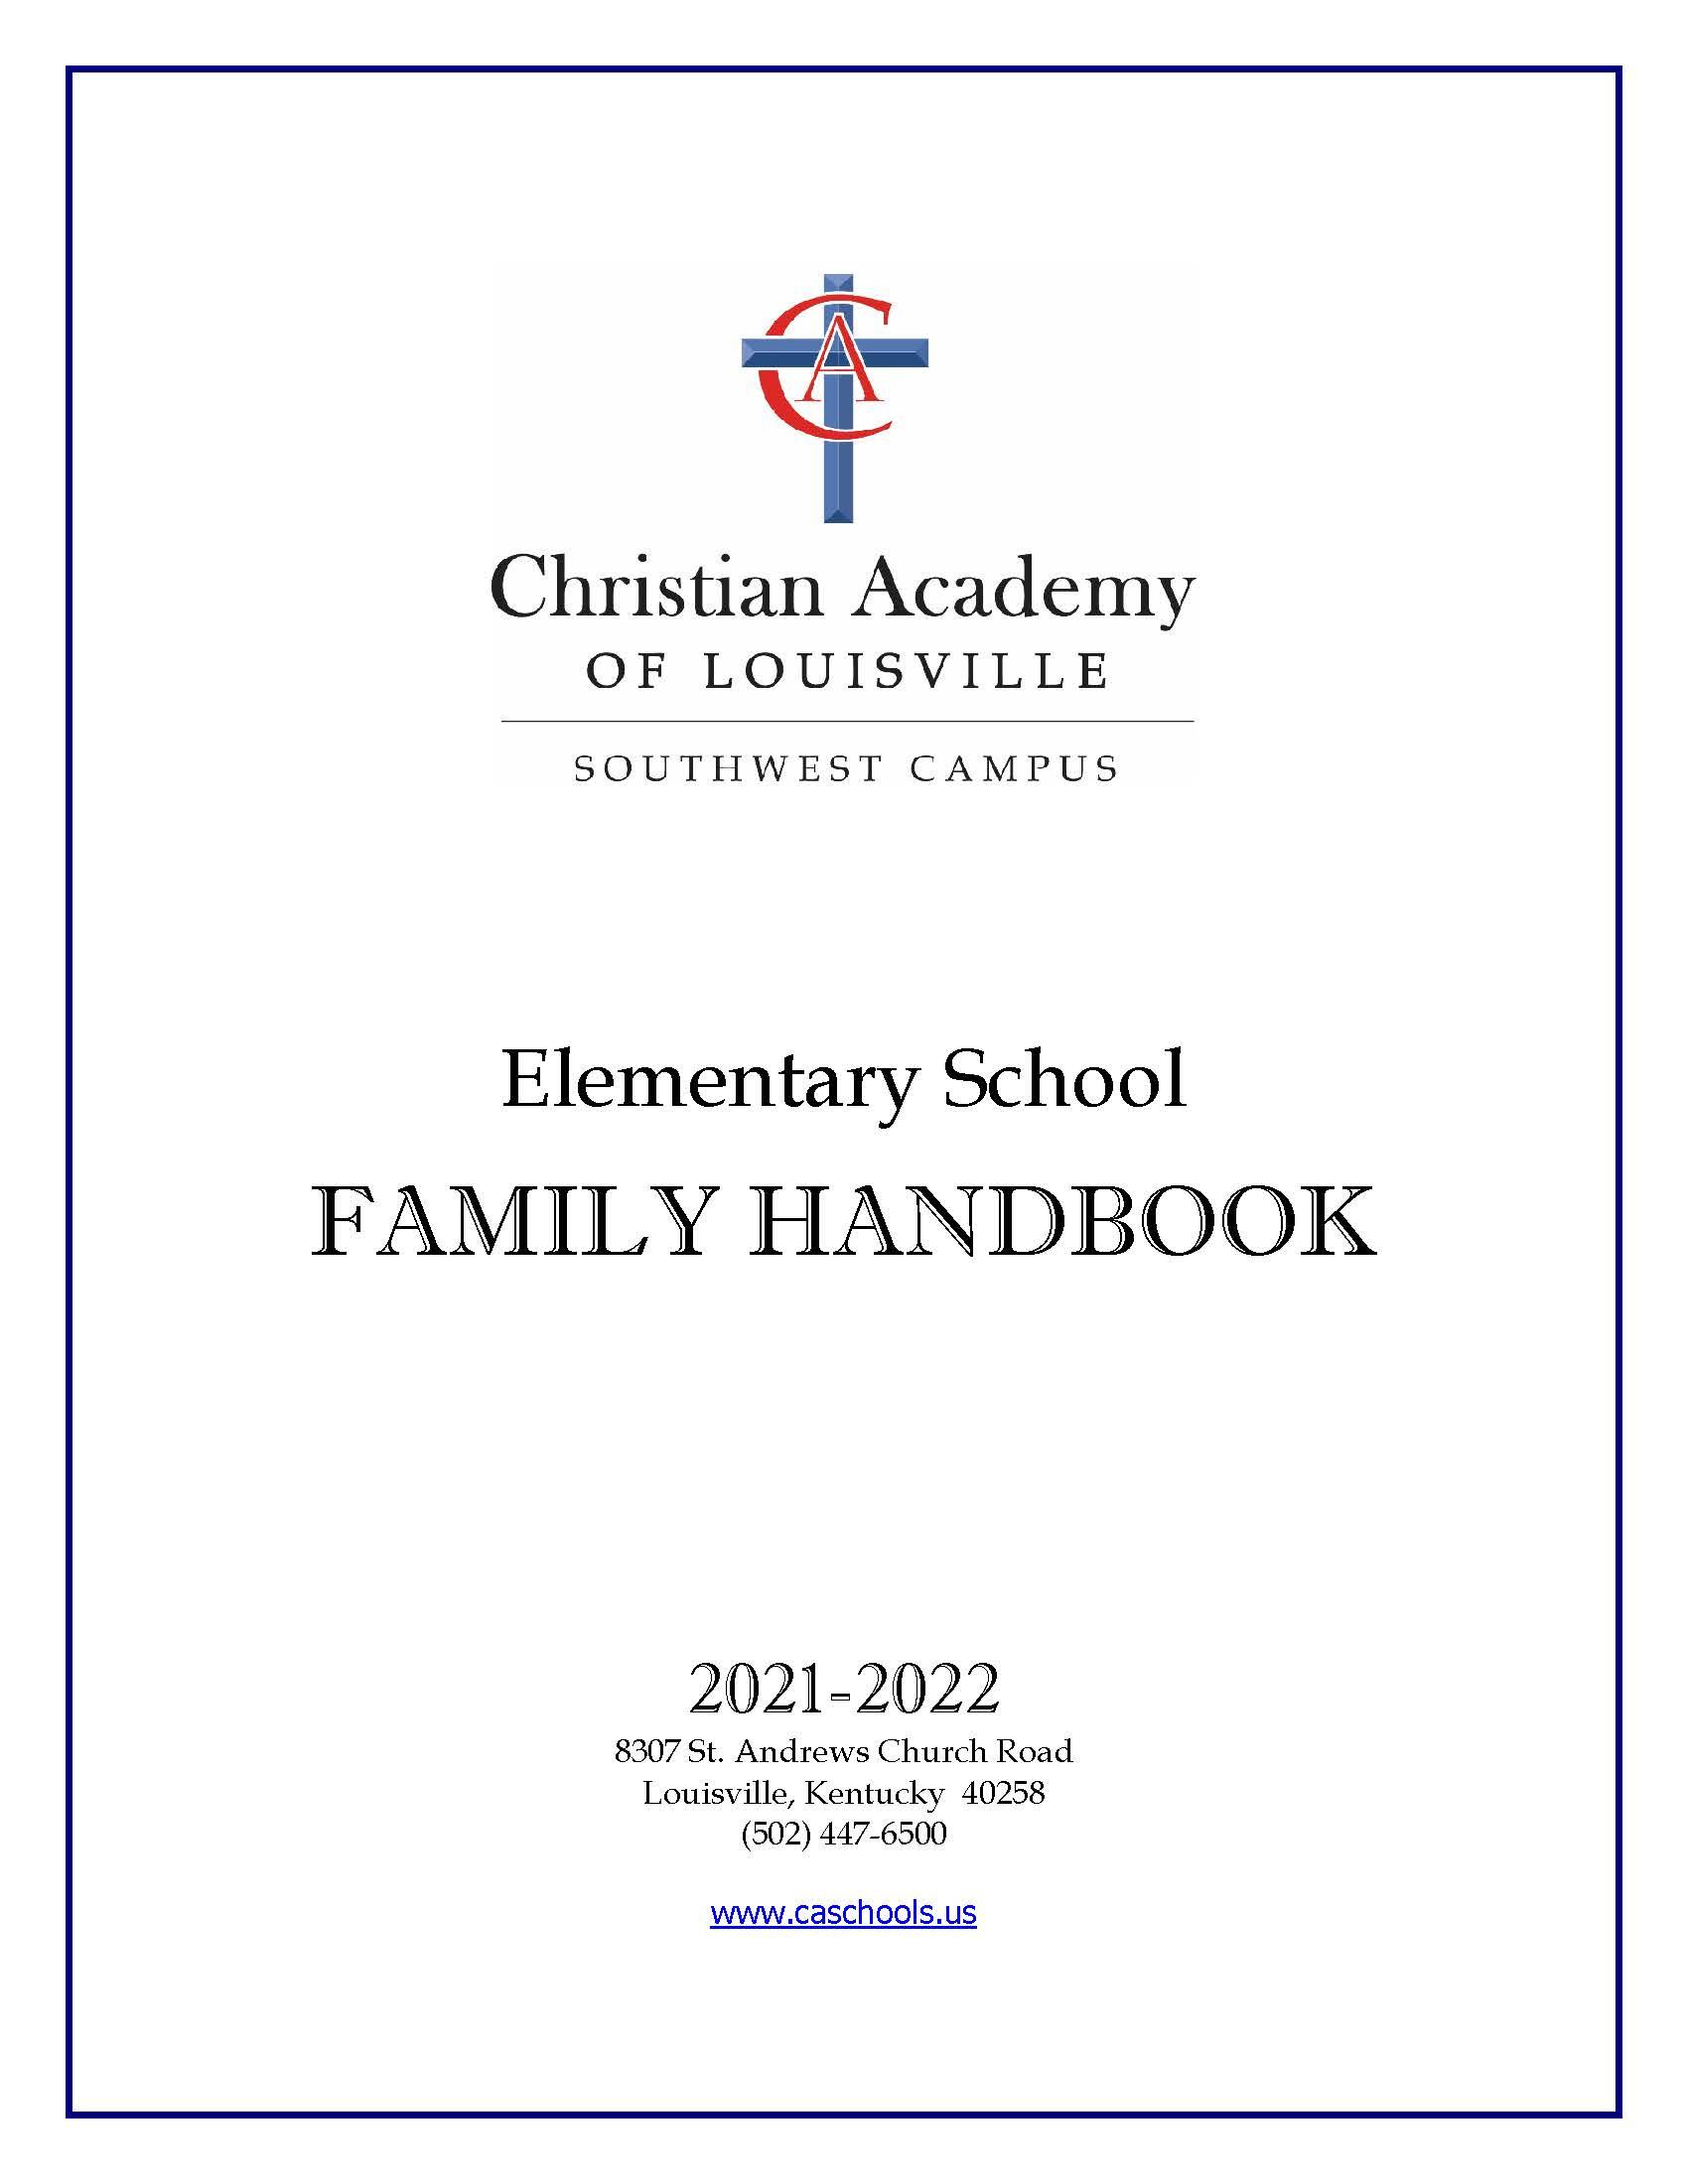 Christian Academy School System | Christian Academy of Louisville - Southwest Elementary | 2021-2022 Family Handbook